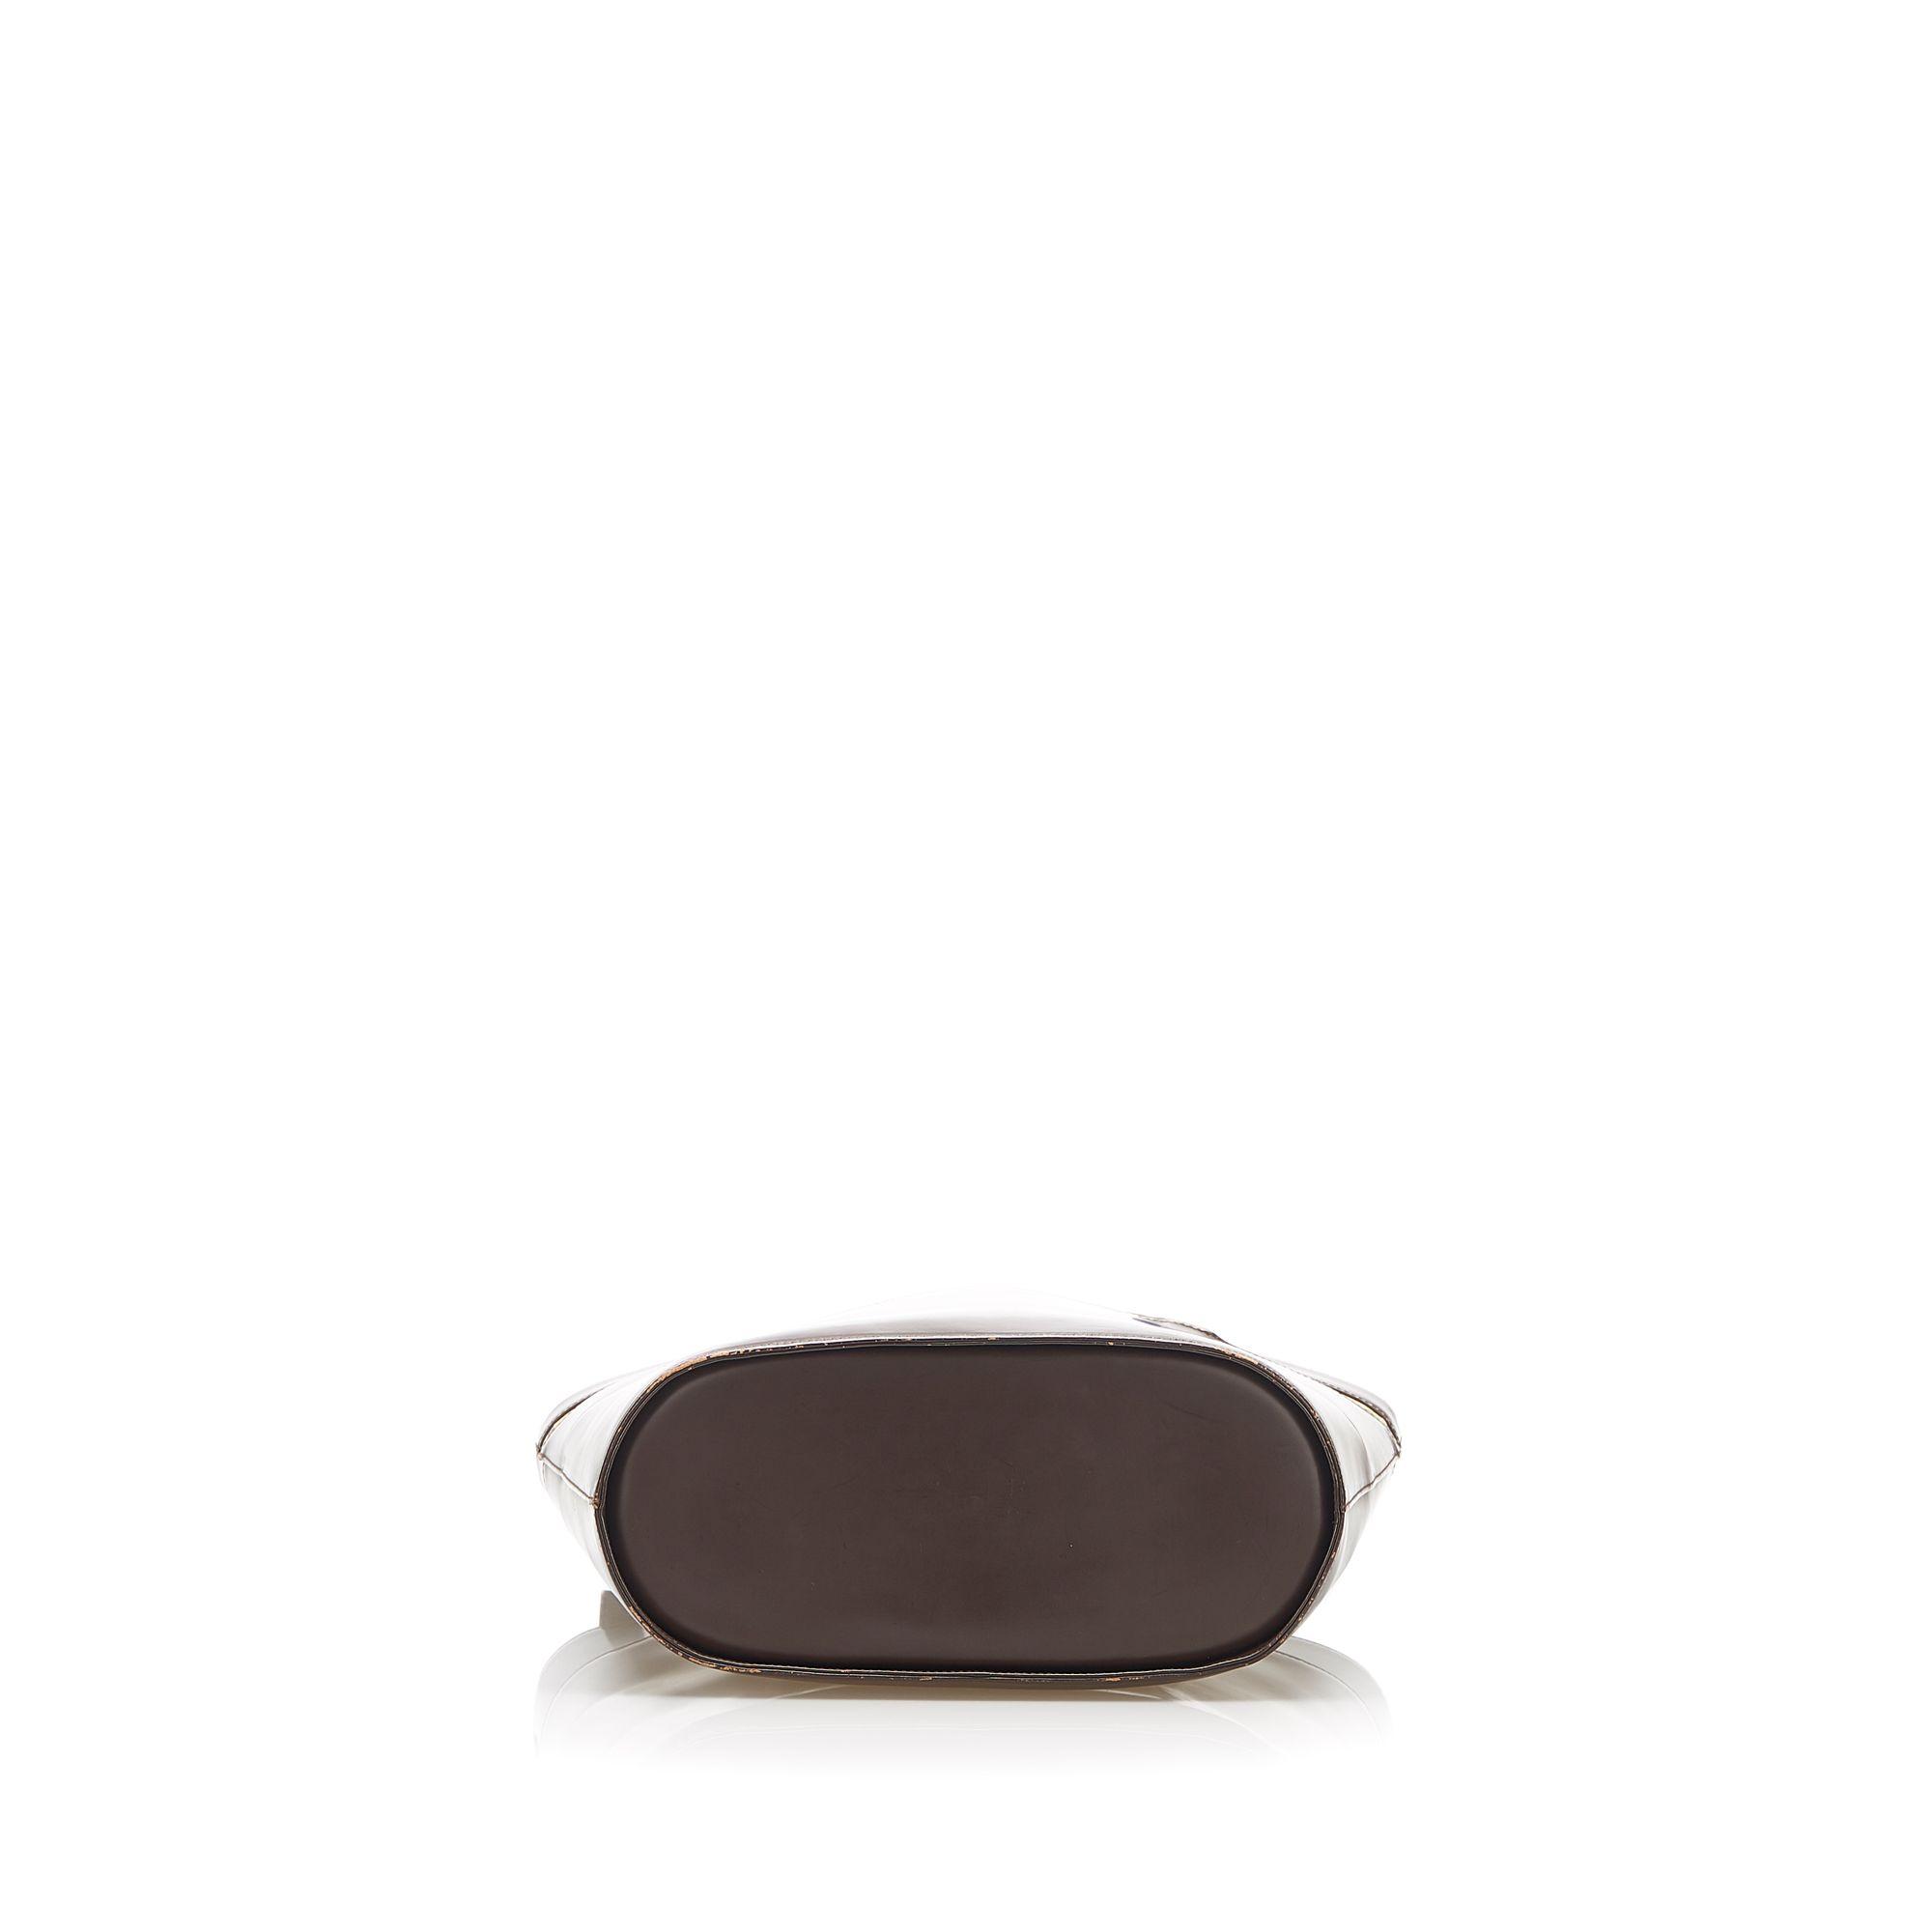 Vintage Burberry Leather Tote Bag Brown